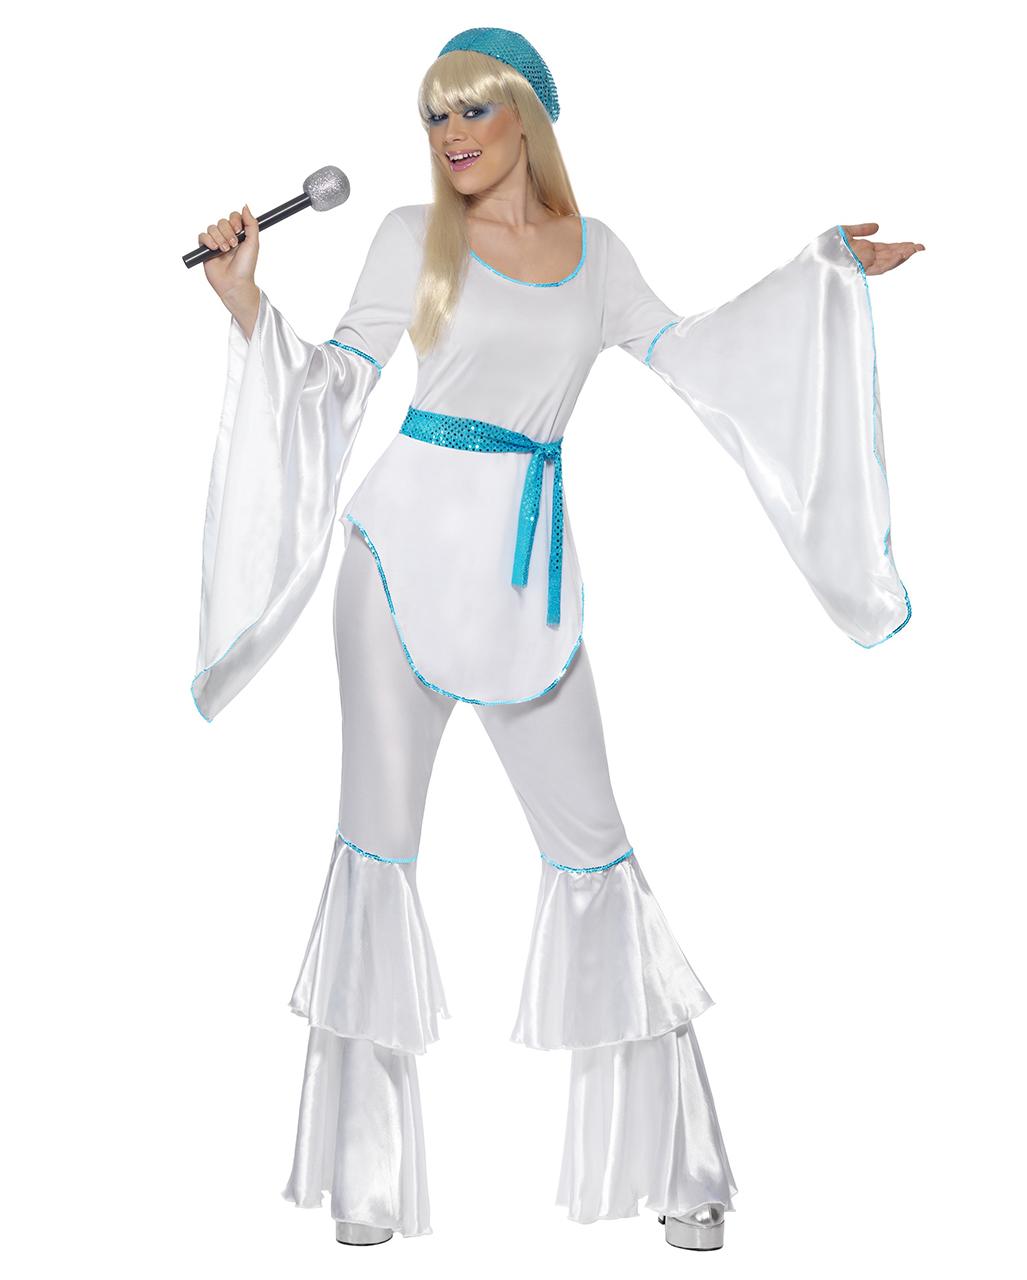 Super Trooper Damen Kostum Dancing Queen Kostum Horror Shop Com